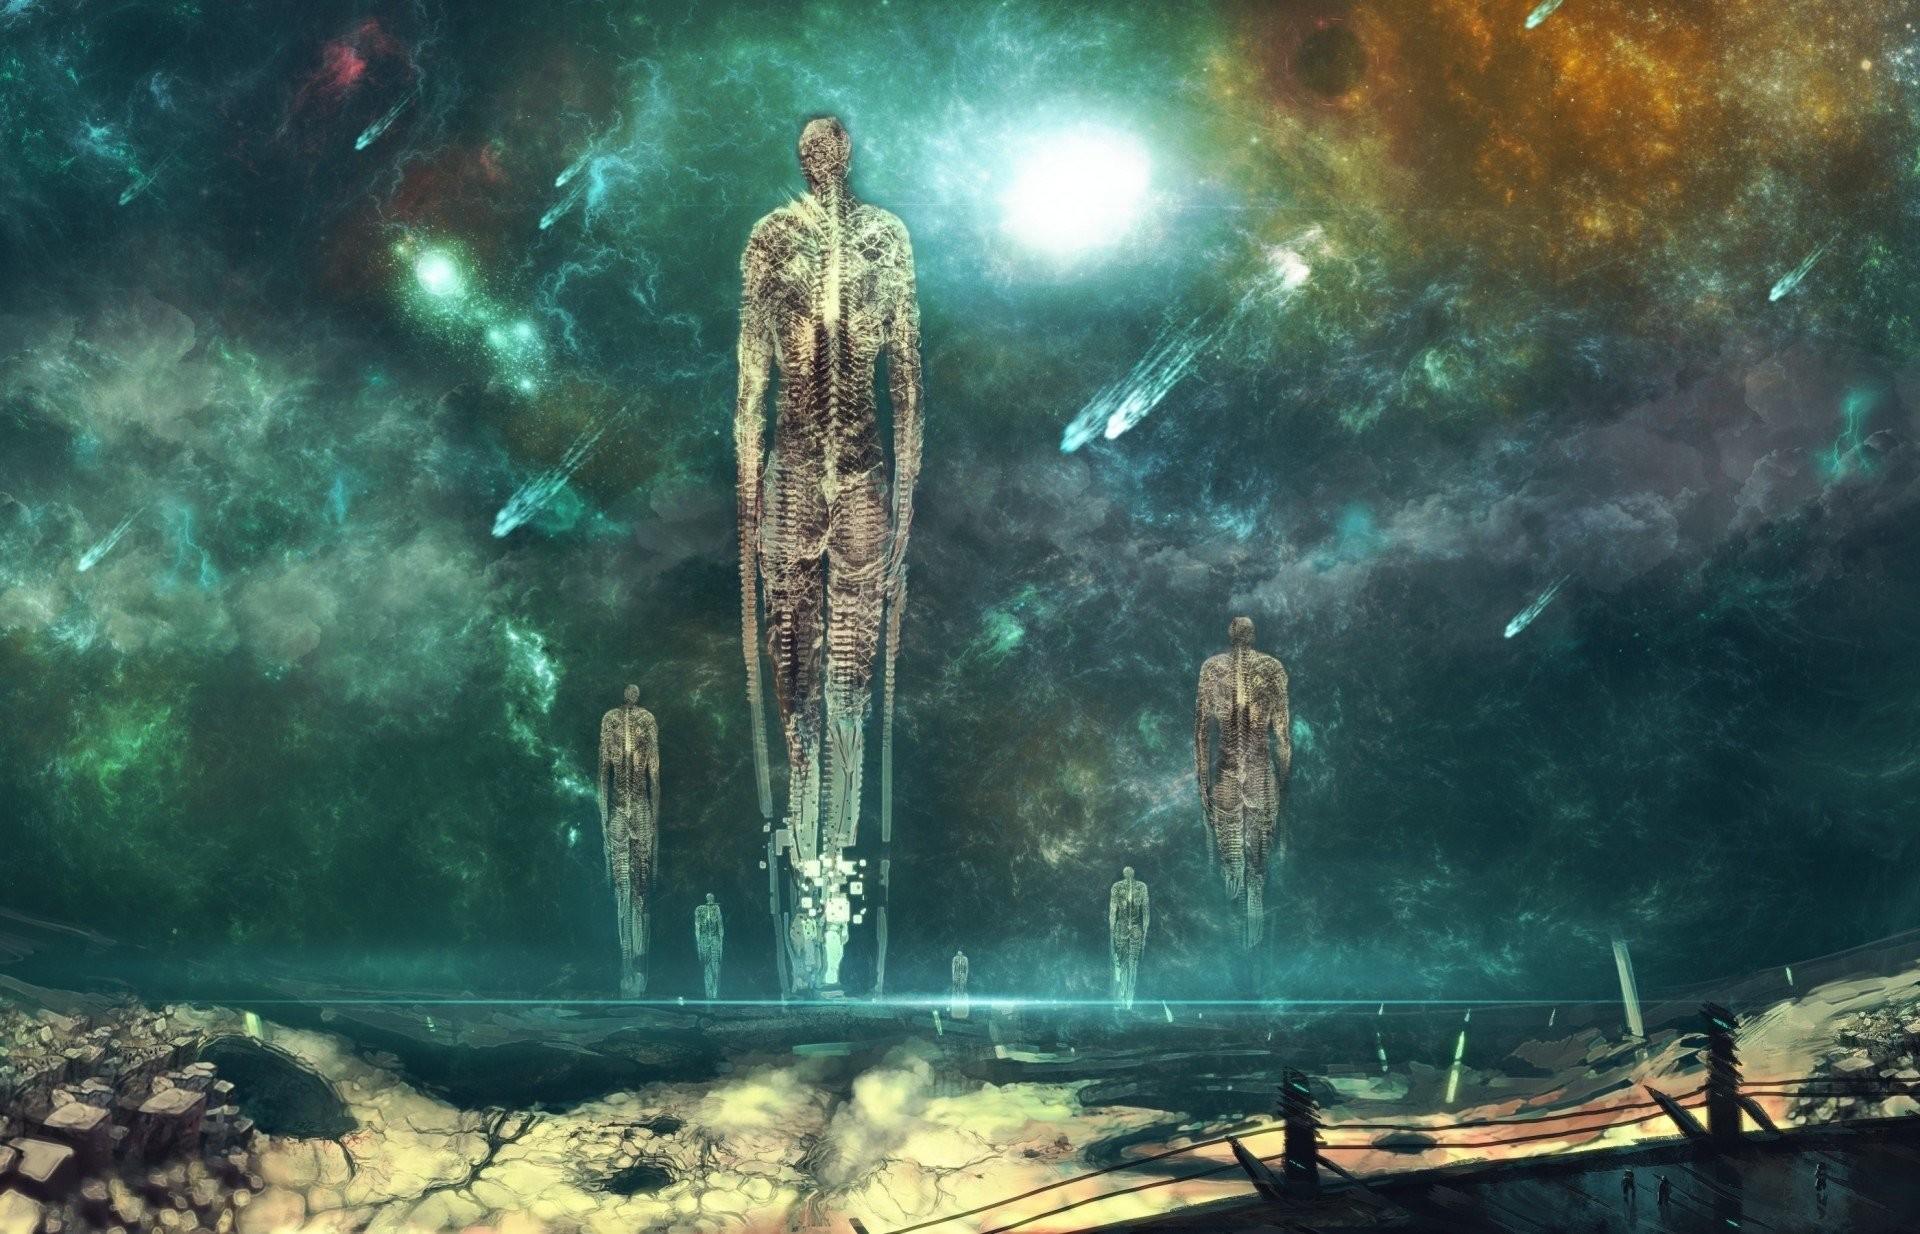 Alien Landscapes Wallpaper 71 Images